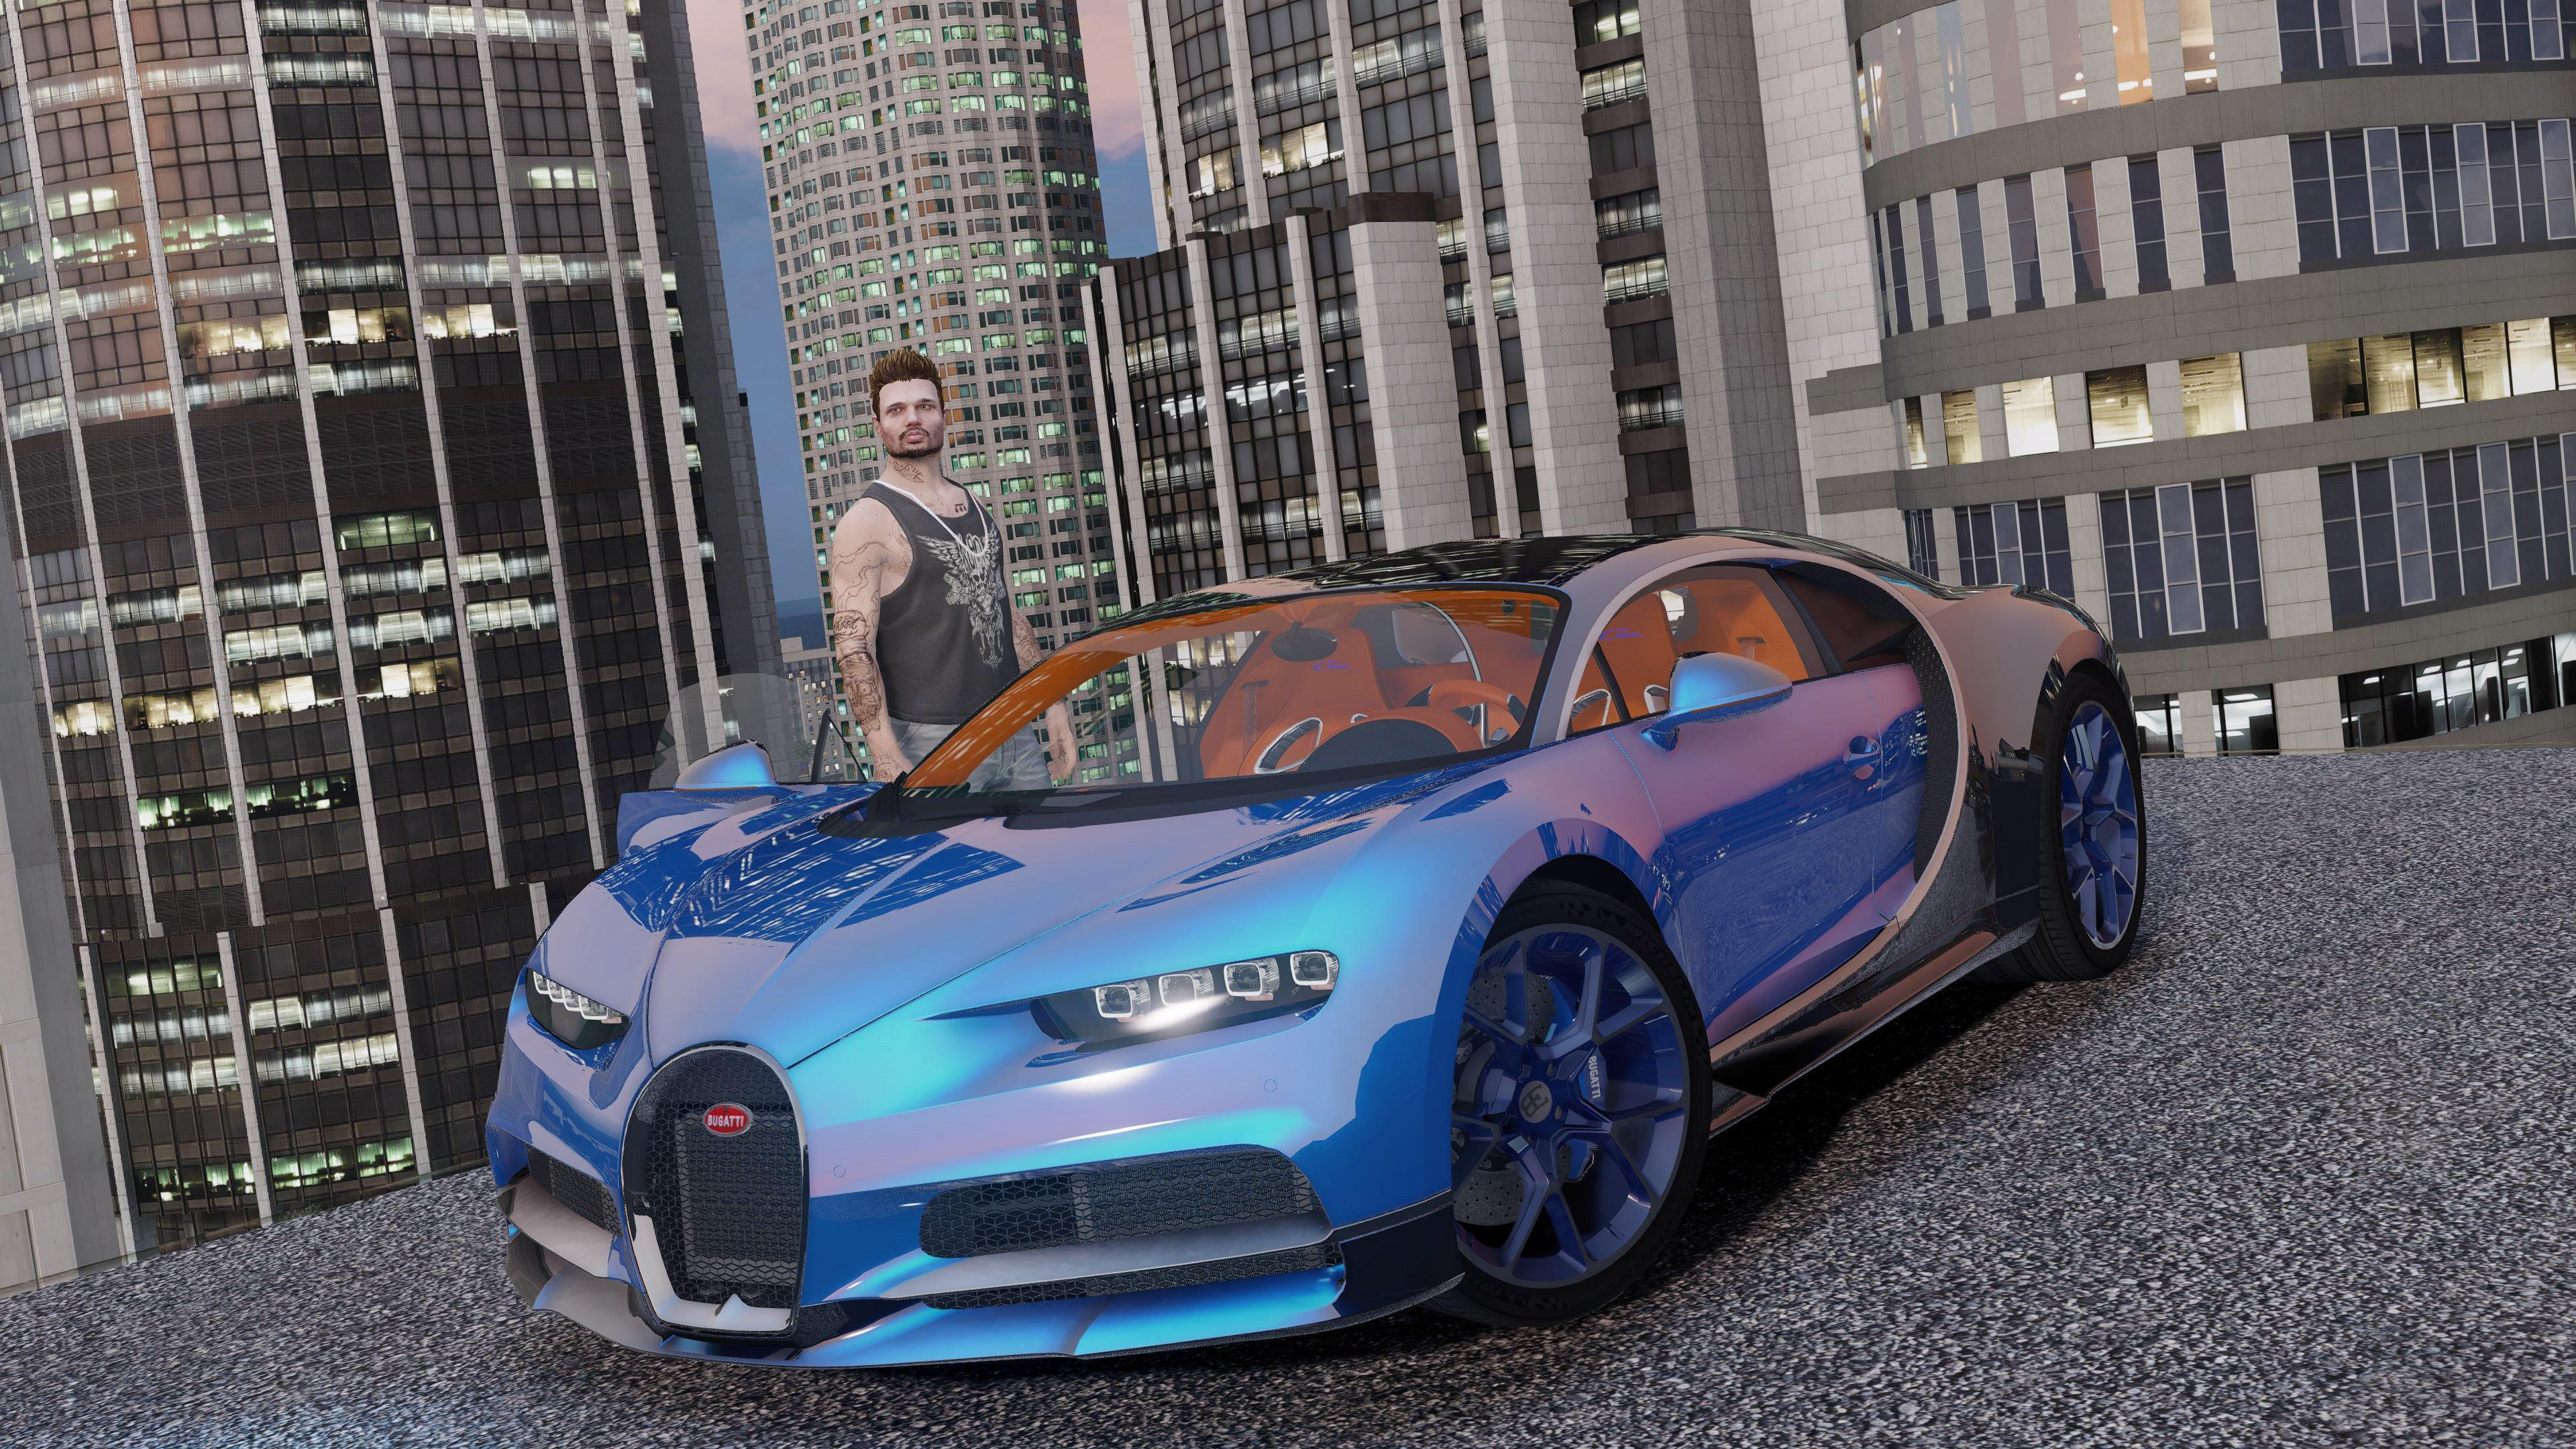 2017 Bugatti Chiron  Livery - GTA5-Mods.com